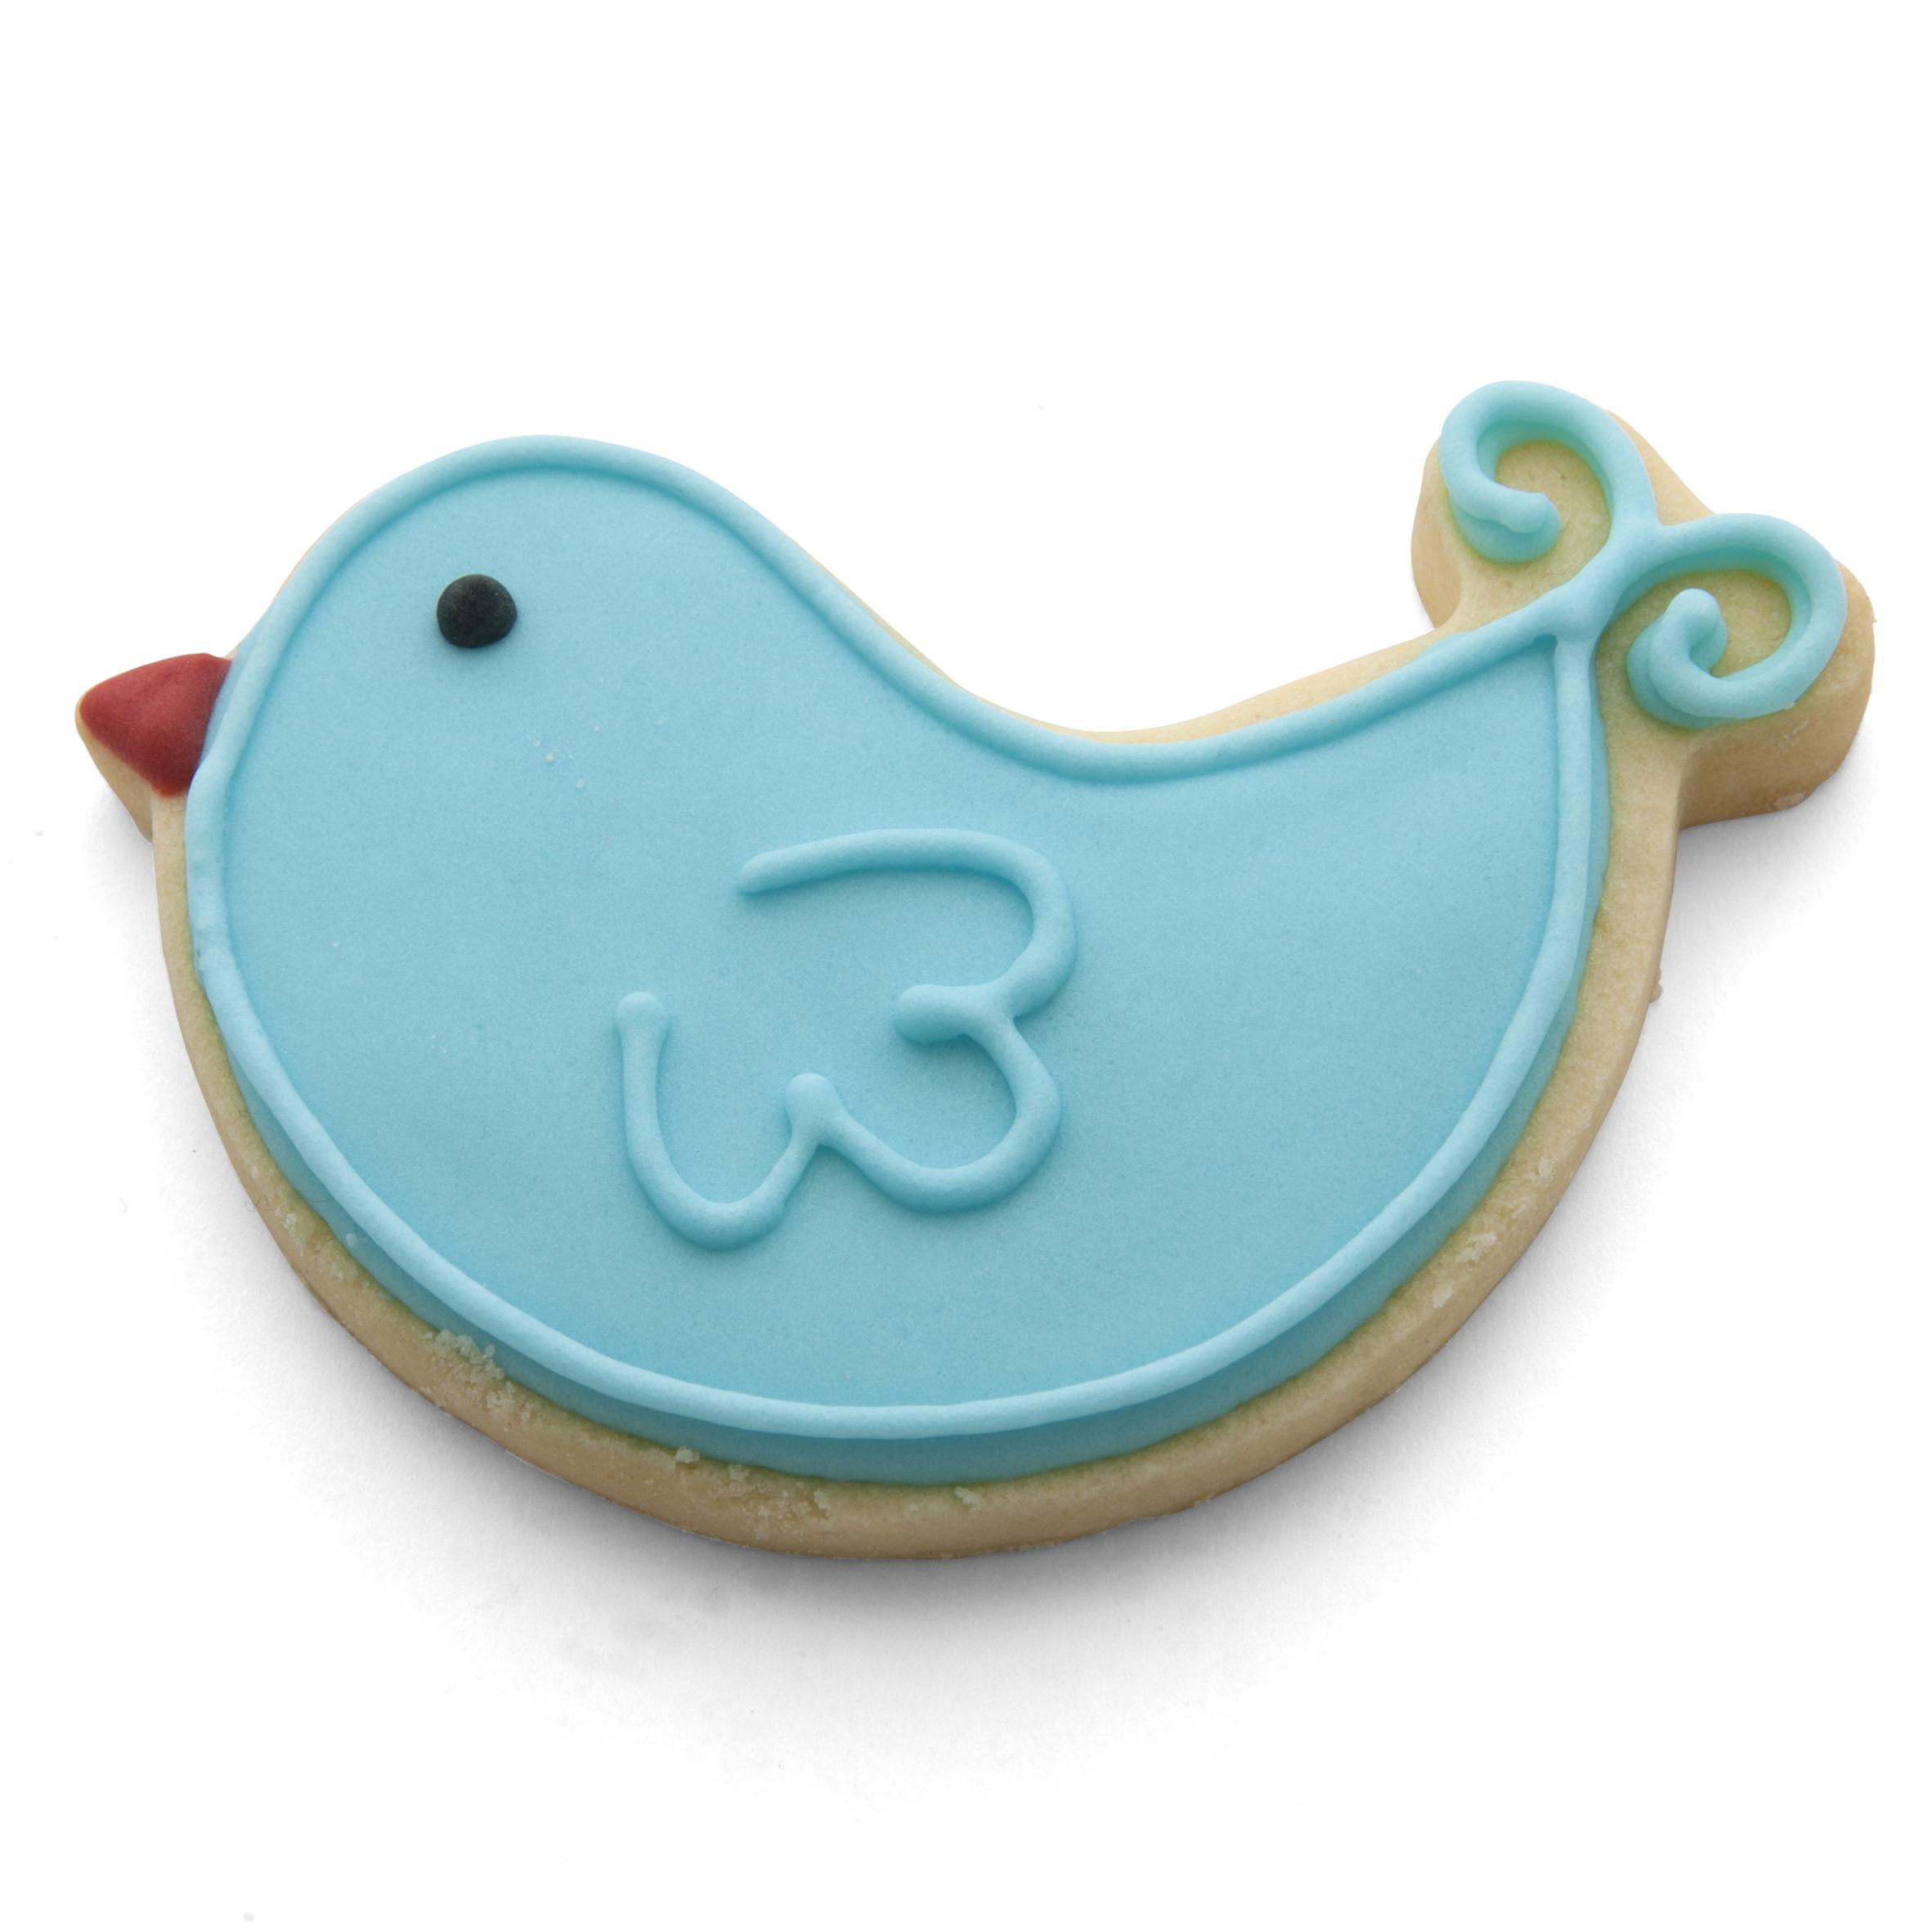 bird loop tail cookie cutter